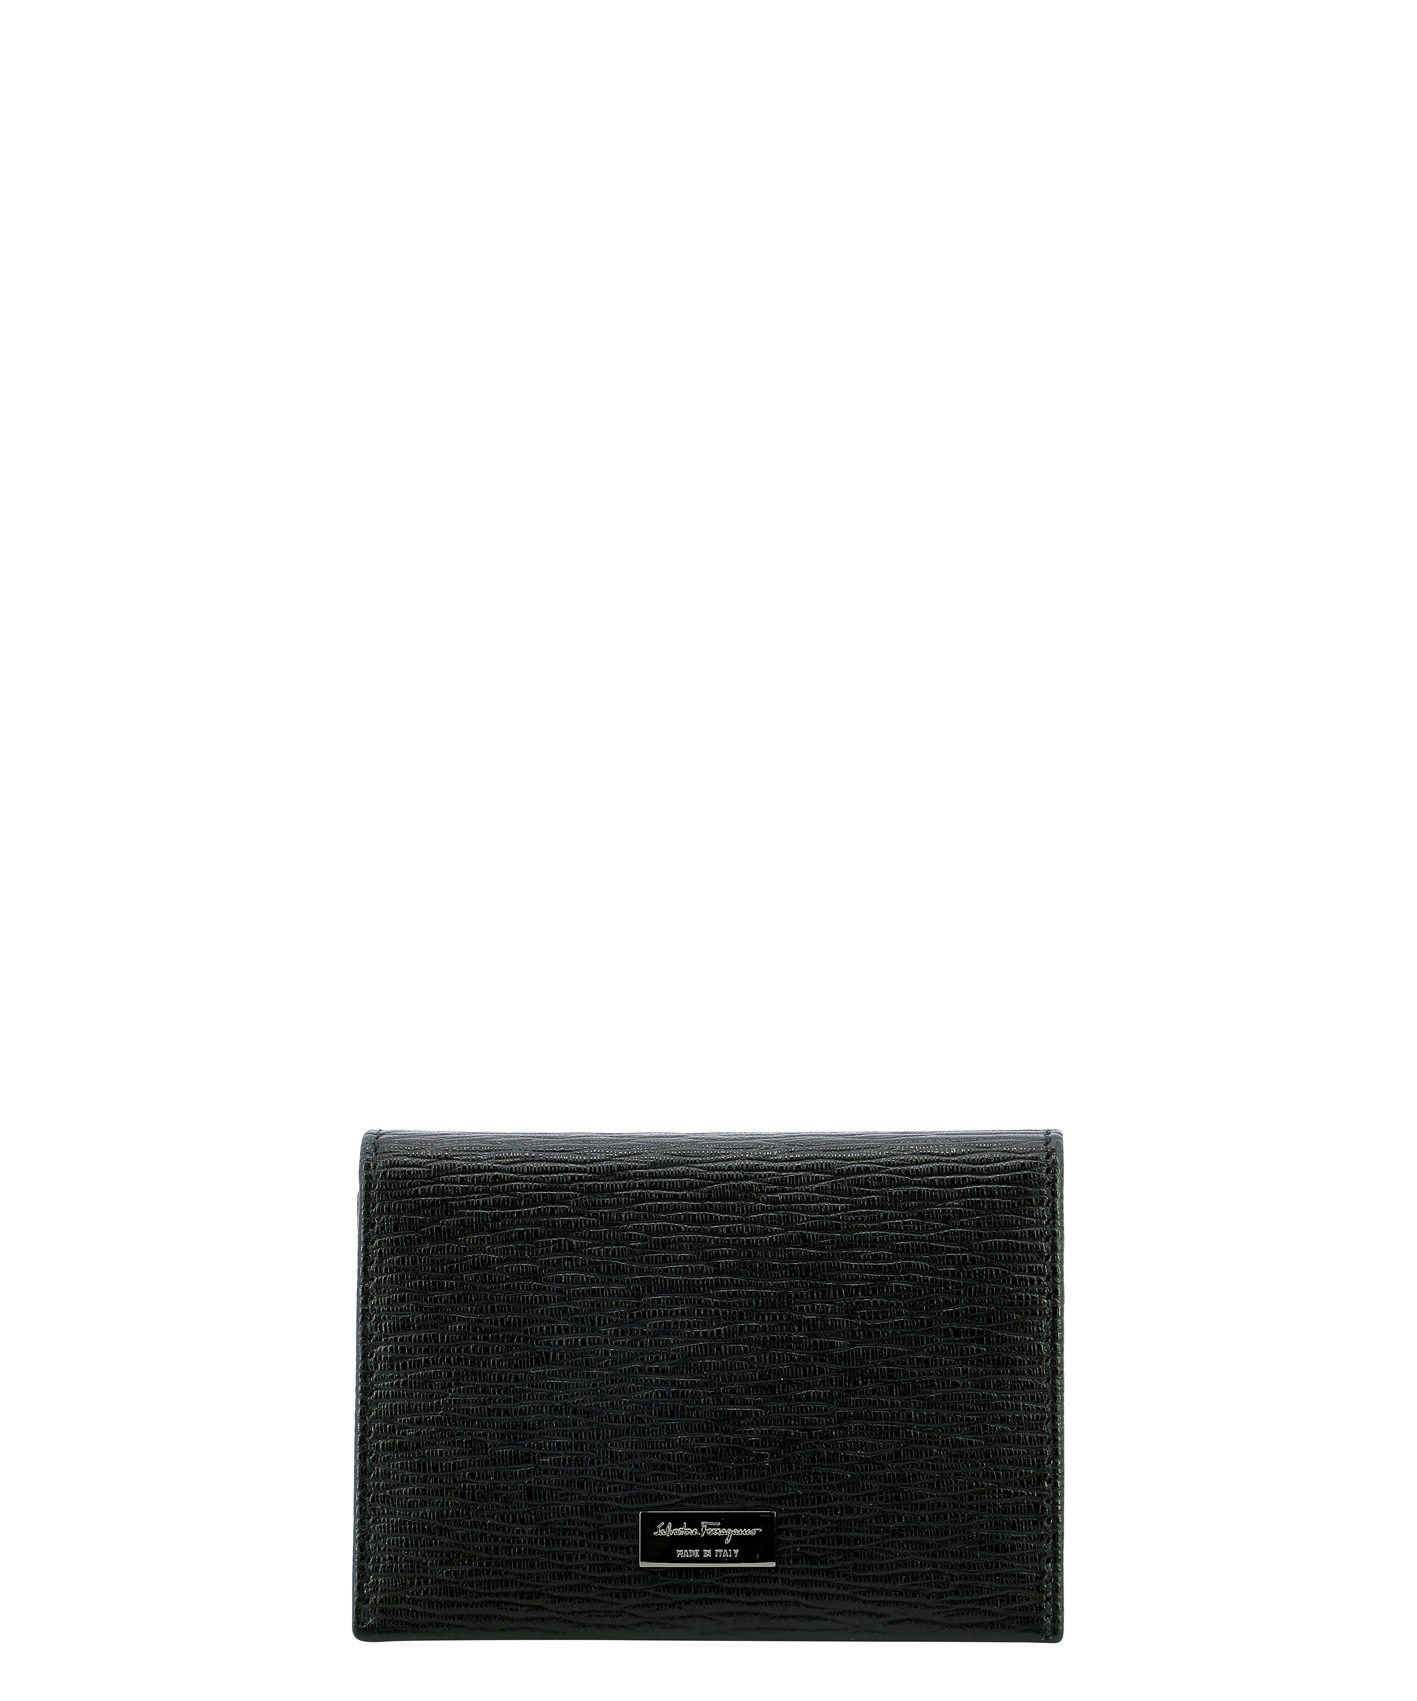 Salvatore Ferragamo Men's Black Other Materials Wallet